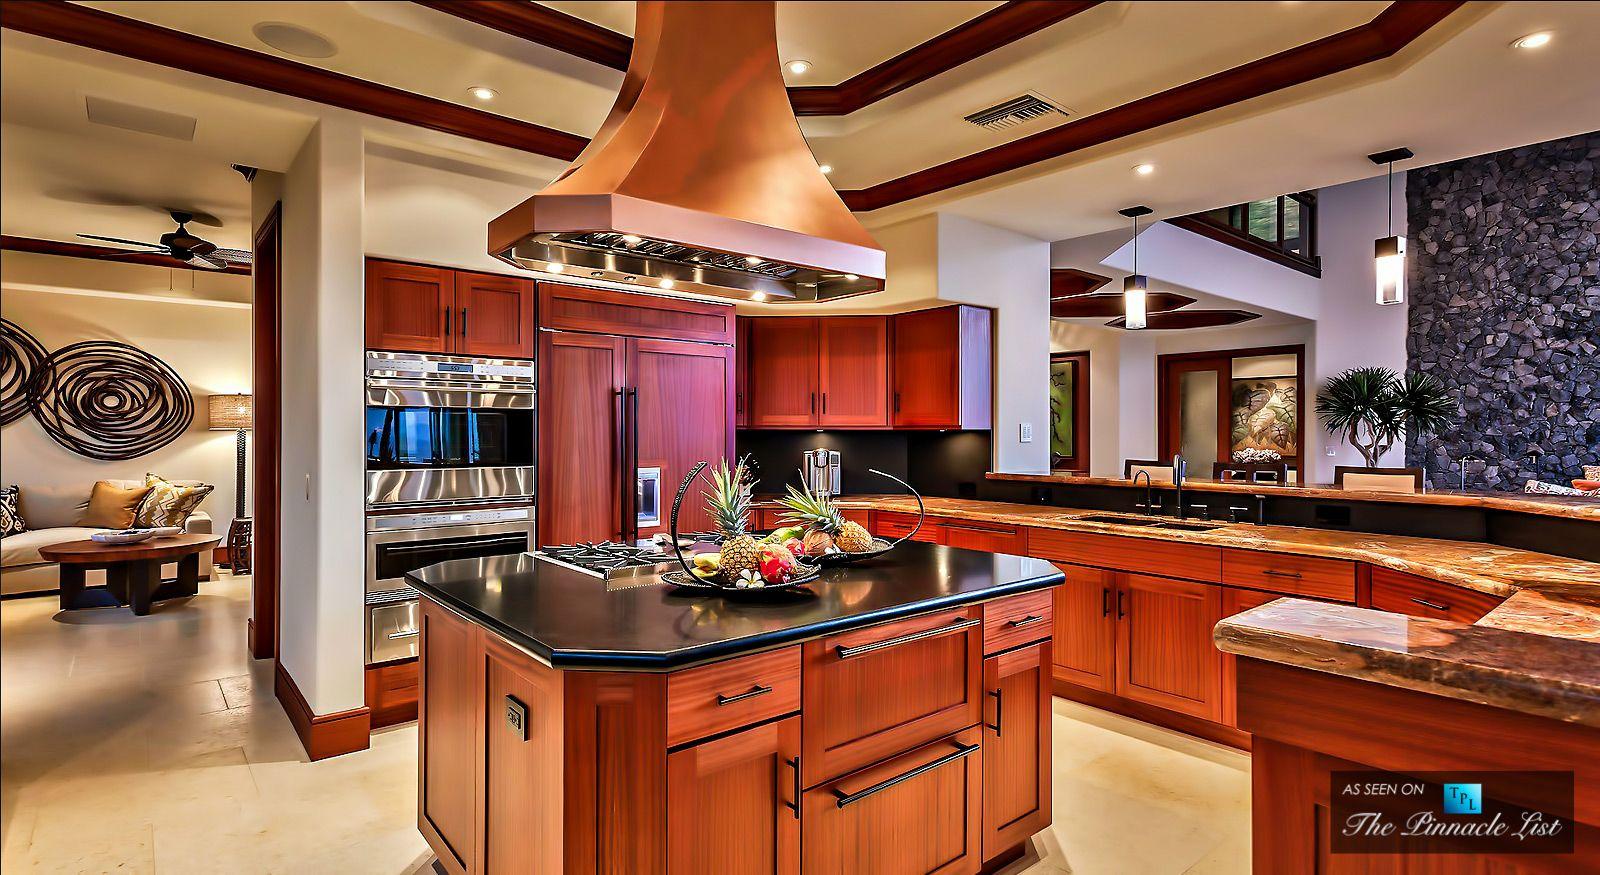 maui hotels with kitchens moen kitchen faucet warranty 3 kapalua place lahaina hawaii home